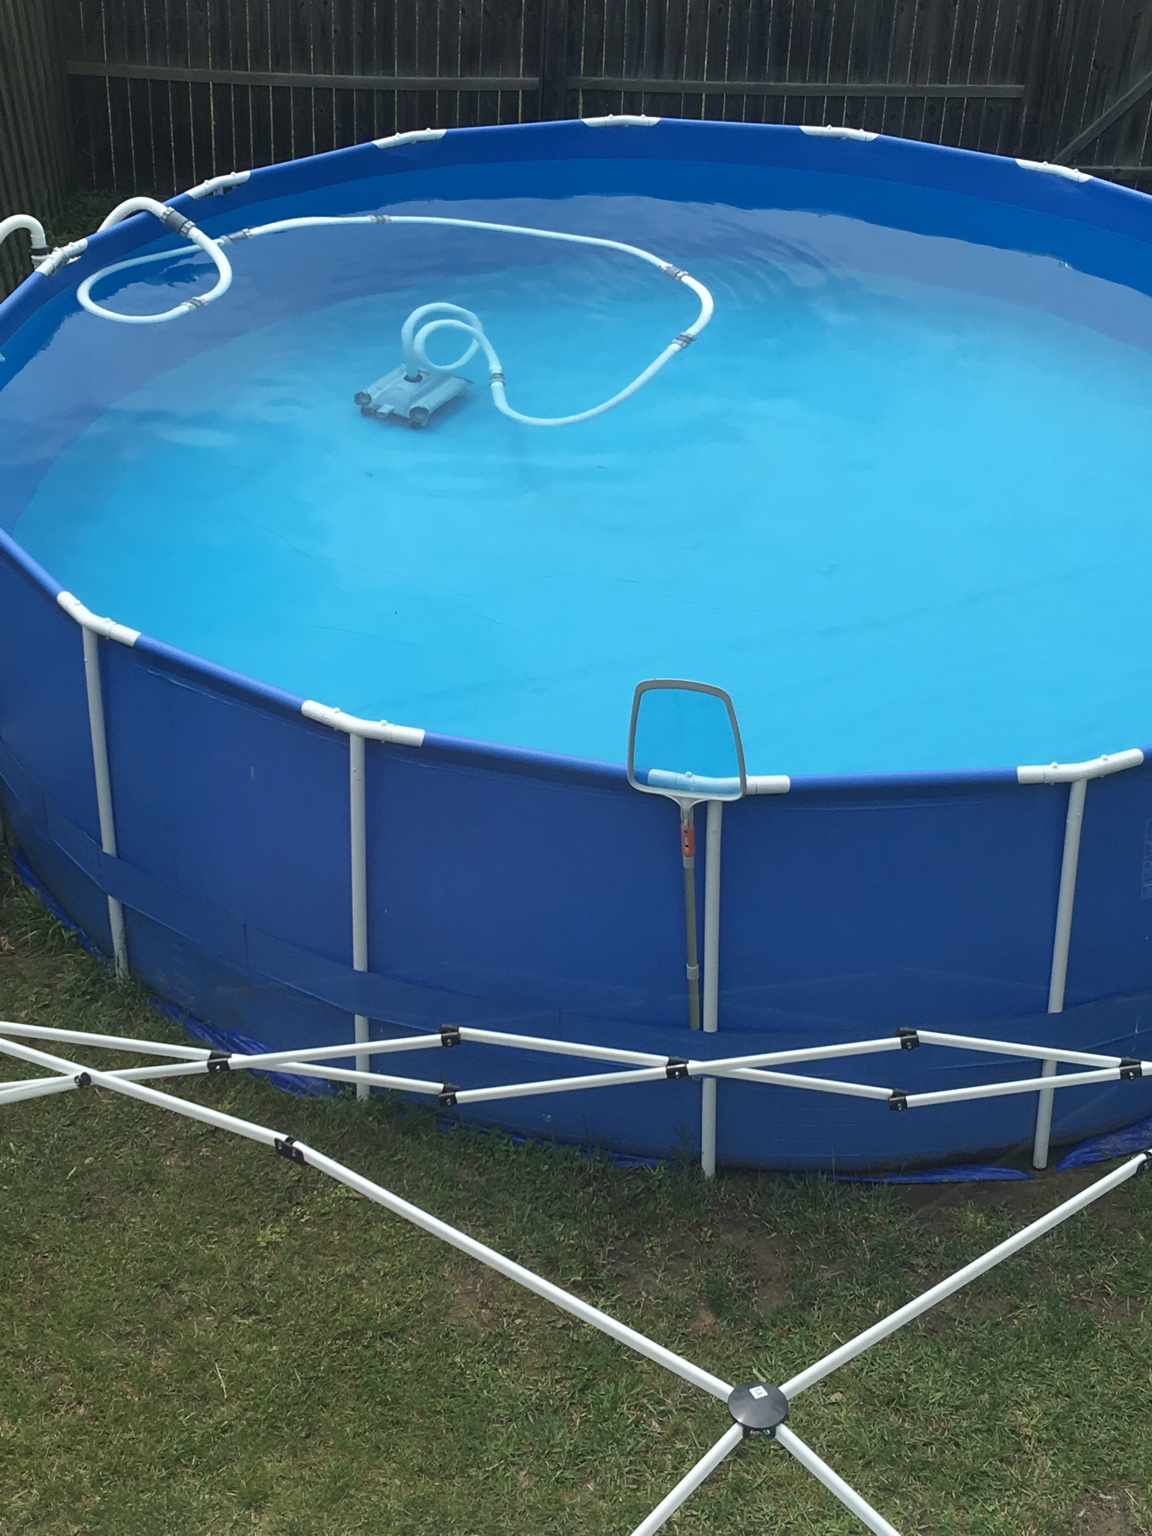 I Got The Intex Automatic Pool Cleaner